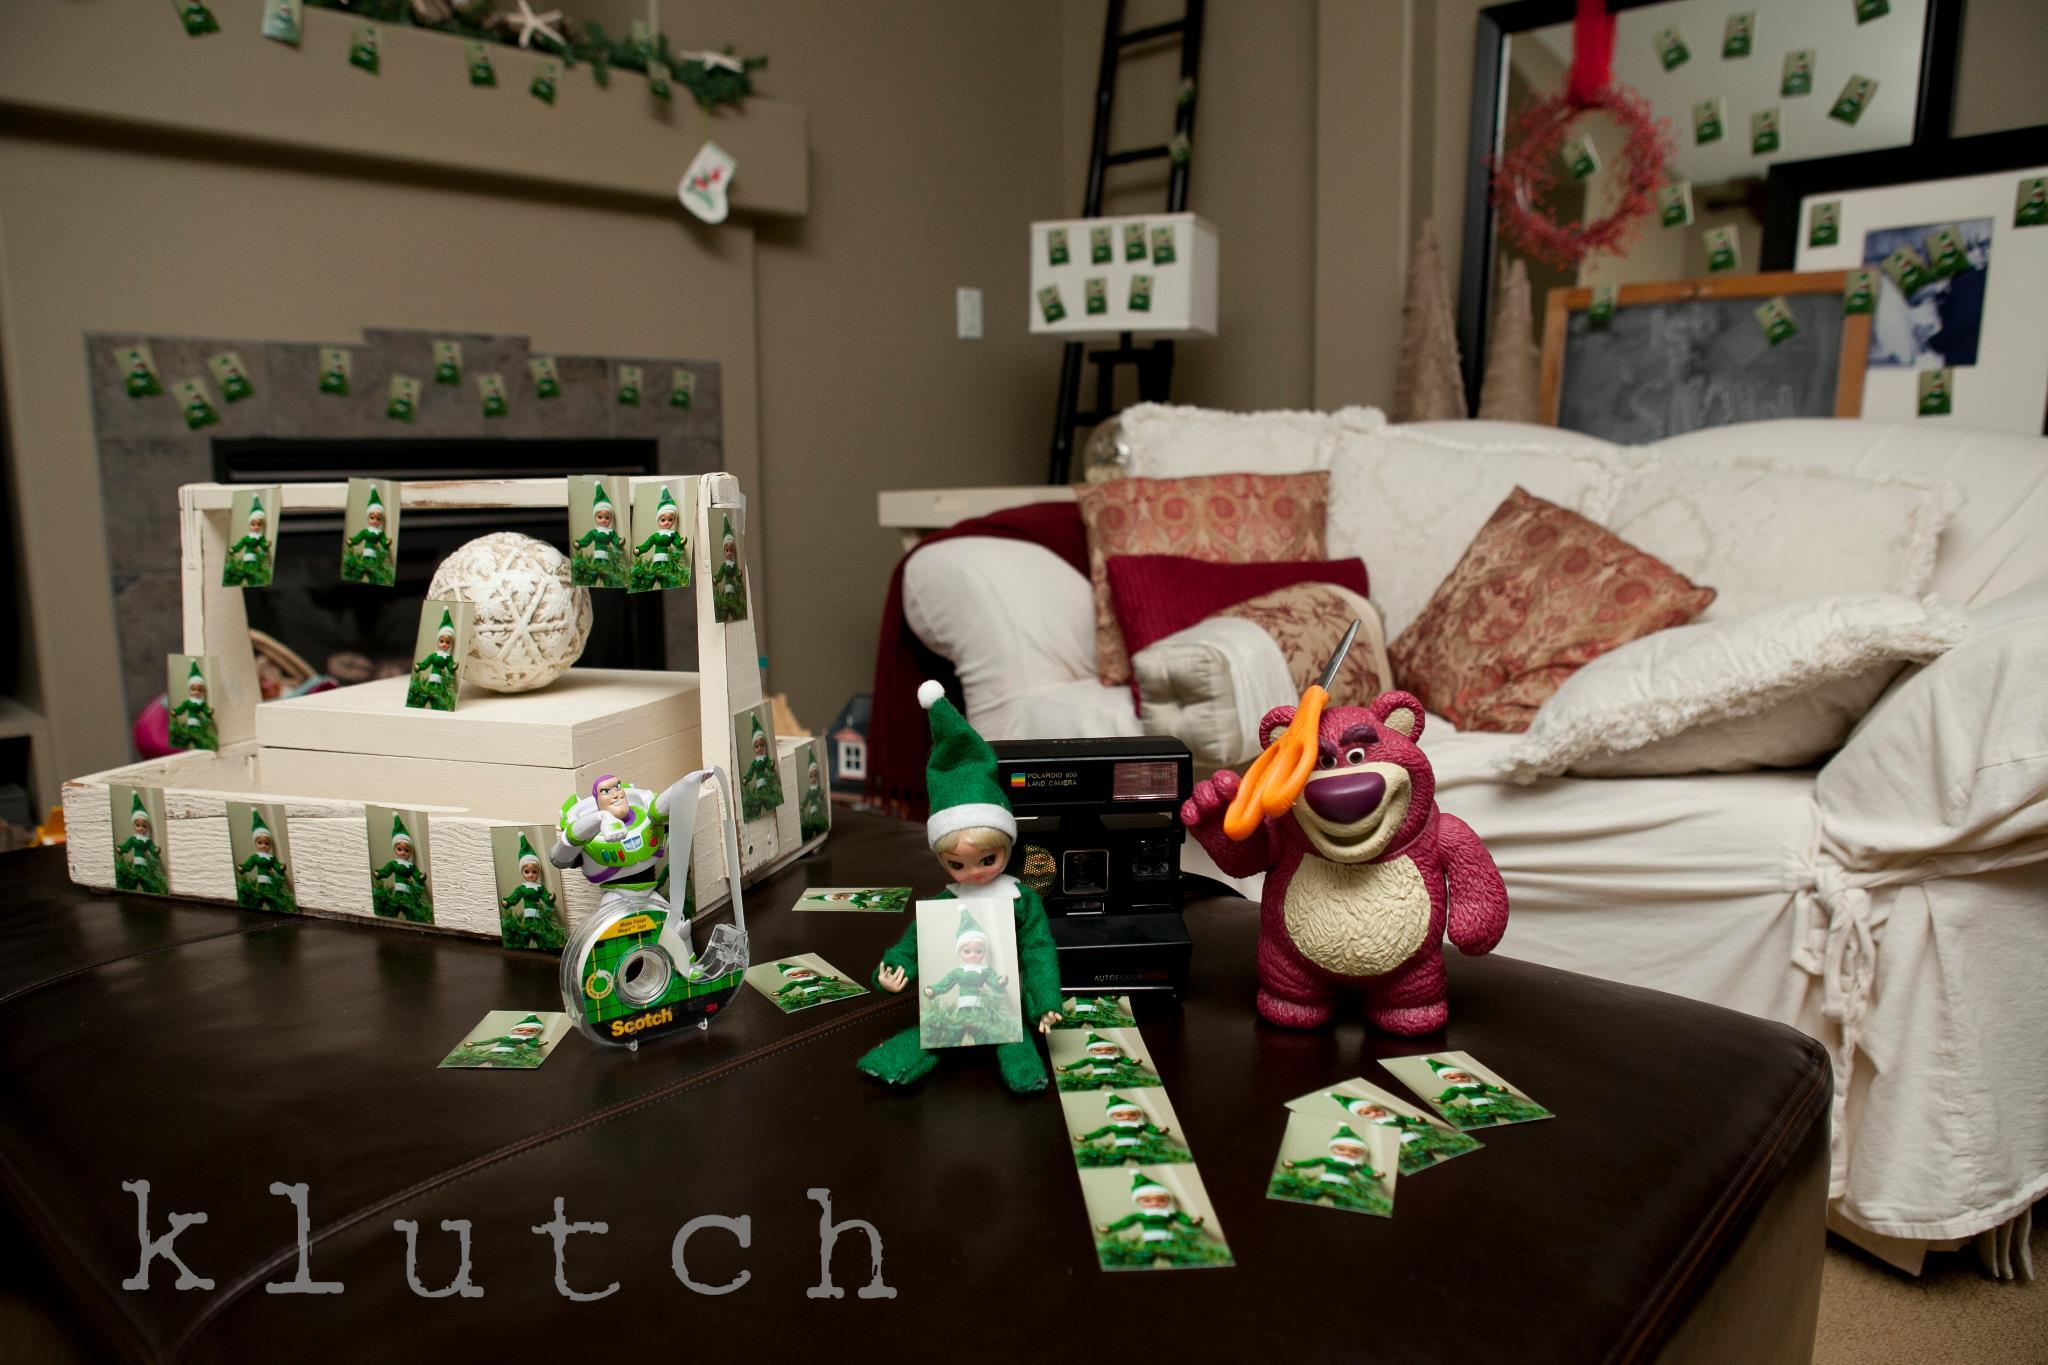 Klutch Photography, family photographer, elf on the shelf, vancouver family photographer, whiterock family photographer, lifeunscripted photographer, lifestlye photographer  ss.jpg